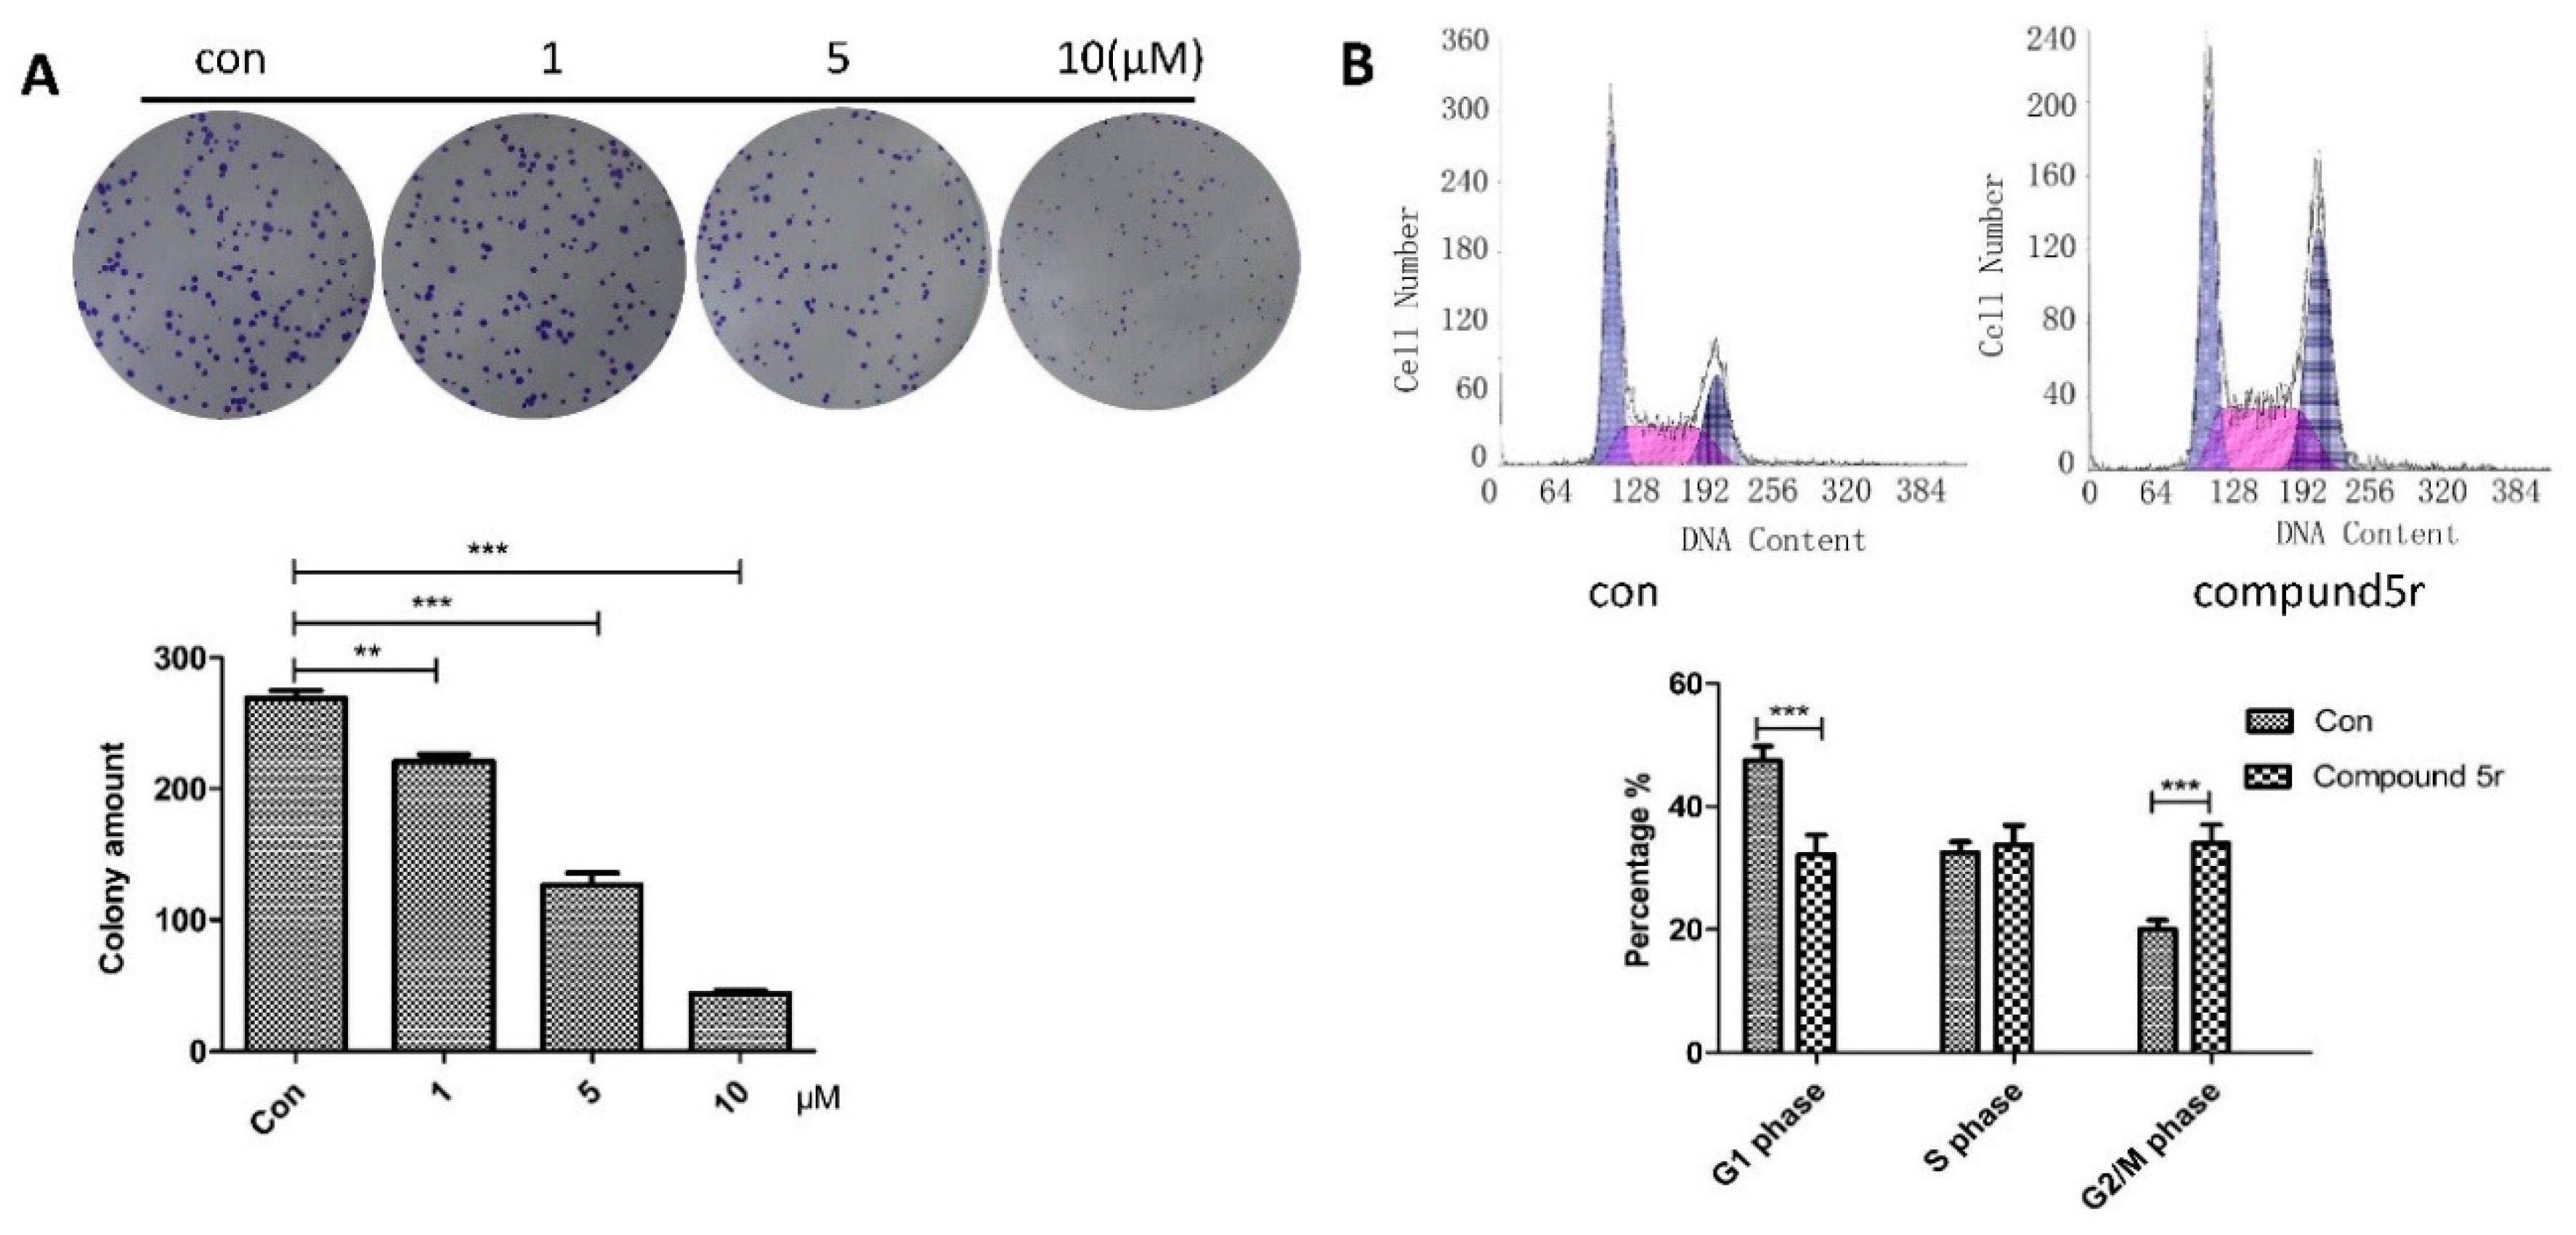 Sample Essay on Protease Inhibitor